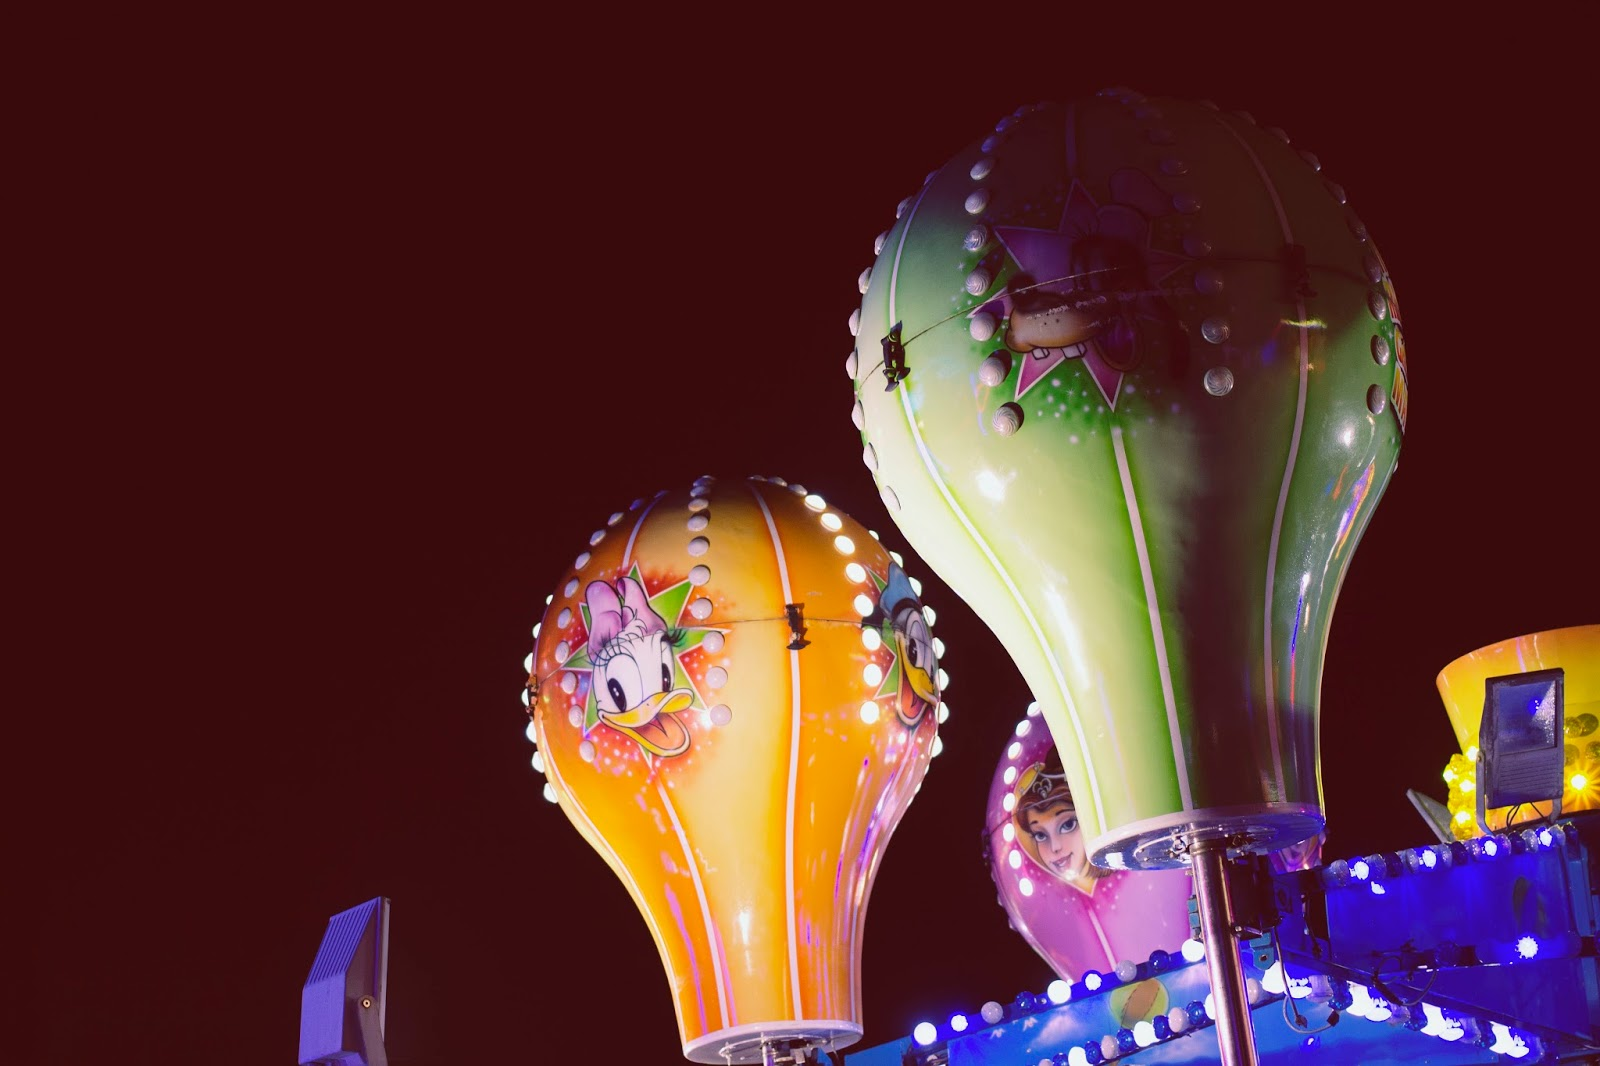 Belper Fair 2016, Proctor's Fun Fairs, Proctor's Fairs, Katie Writes,